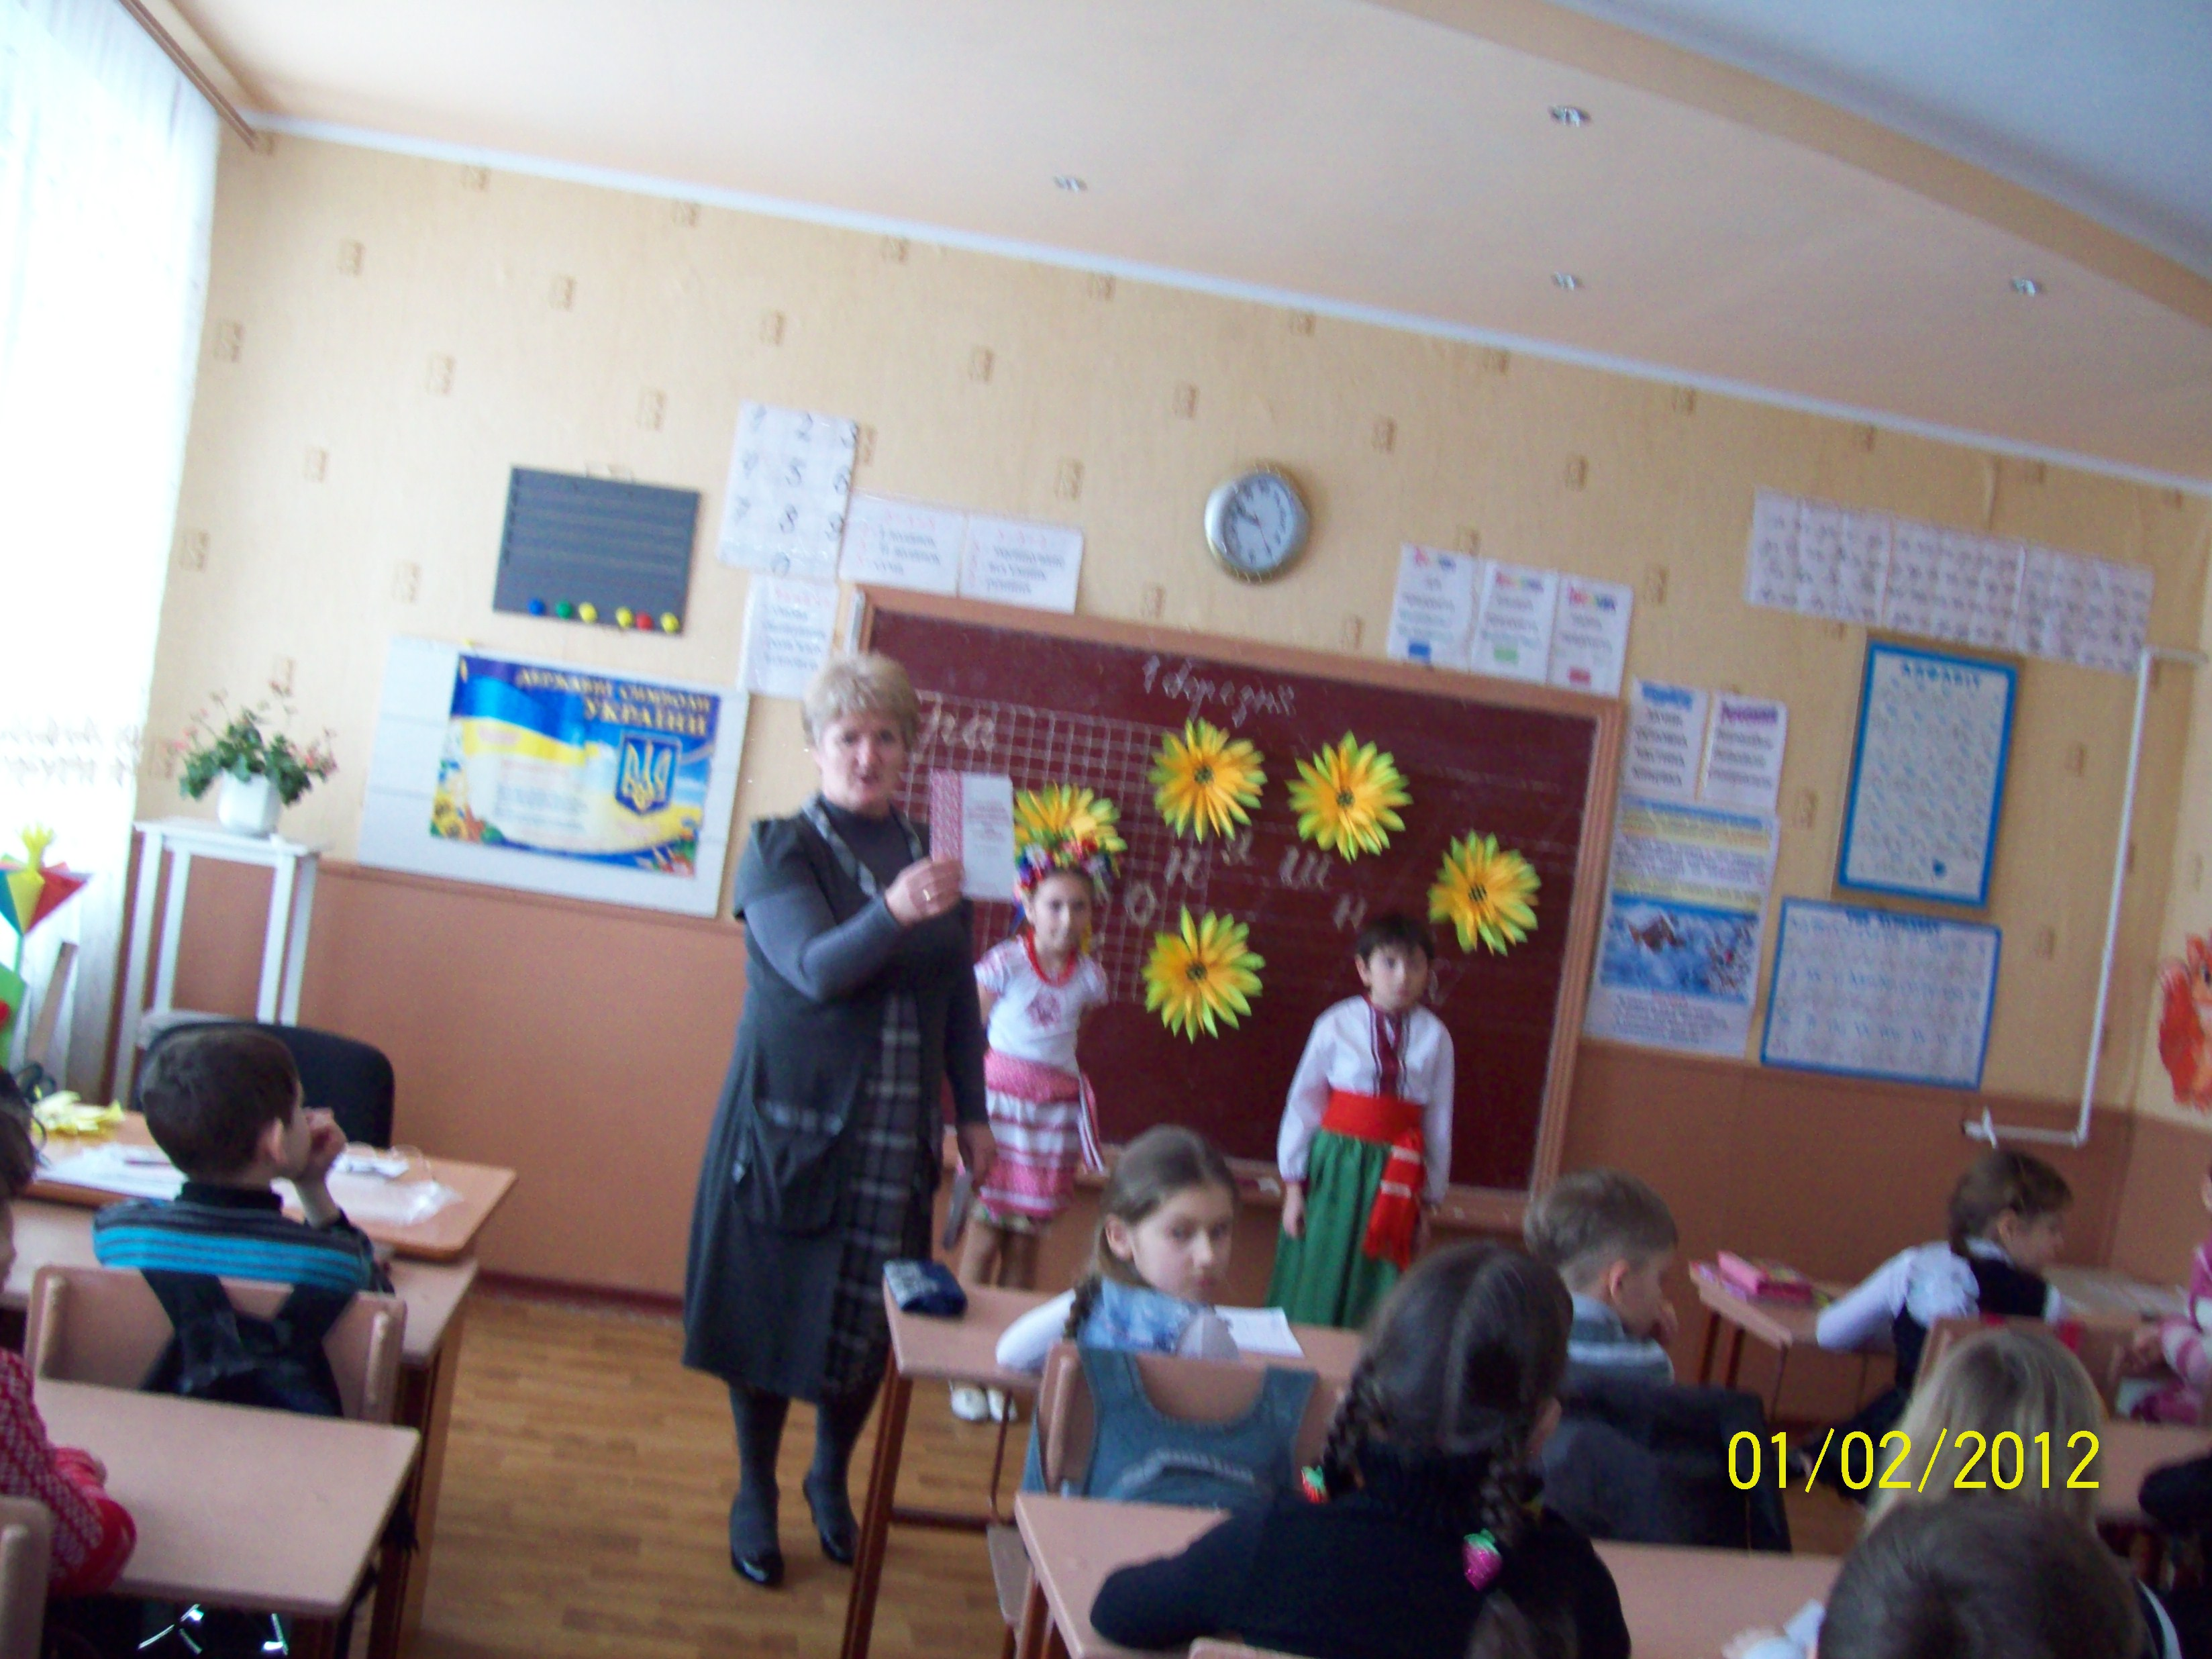 http://school4apost.dnepredu.com/uploads/editor/1500/91761/sitepage_20/101_0258(1).jpg